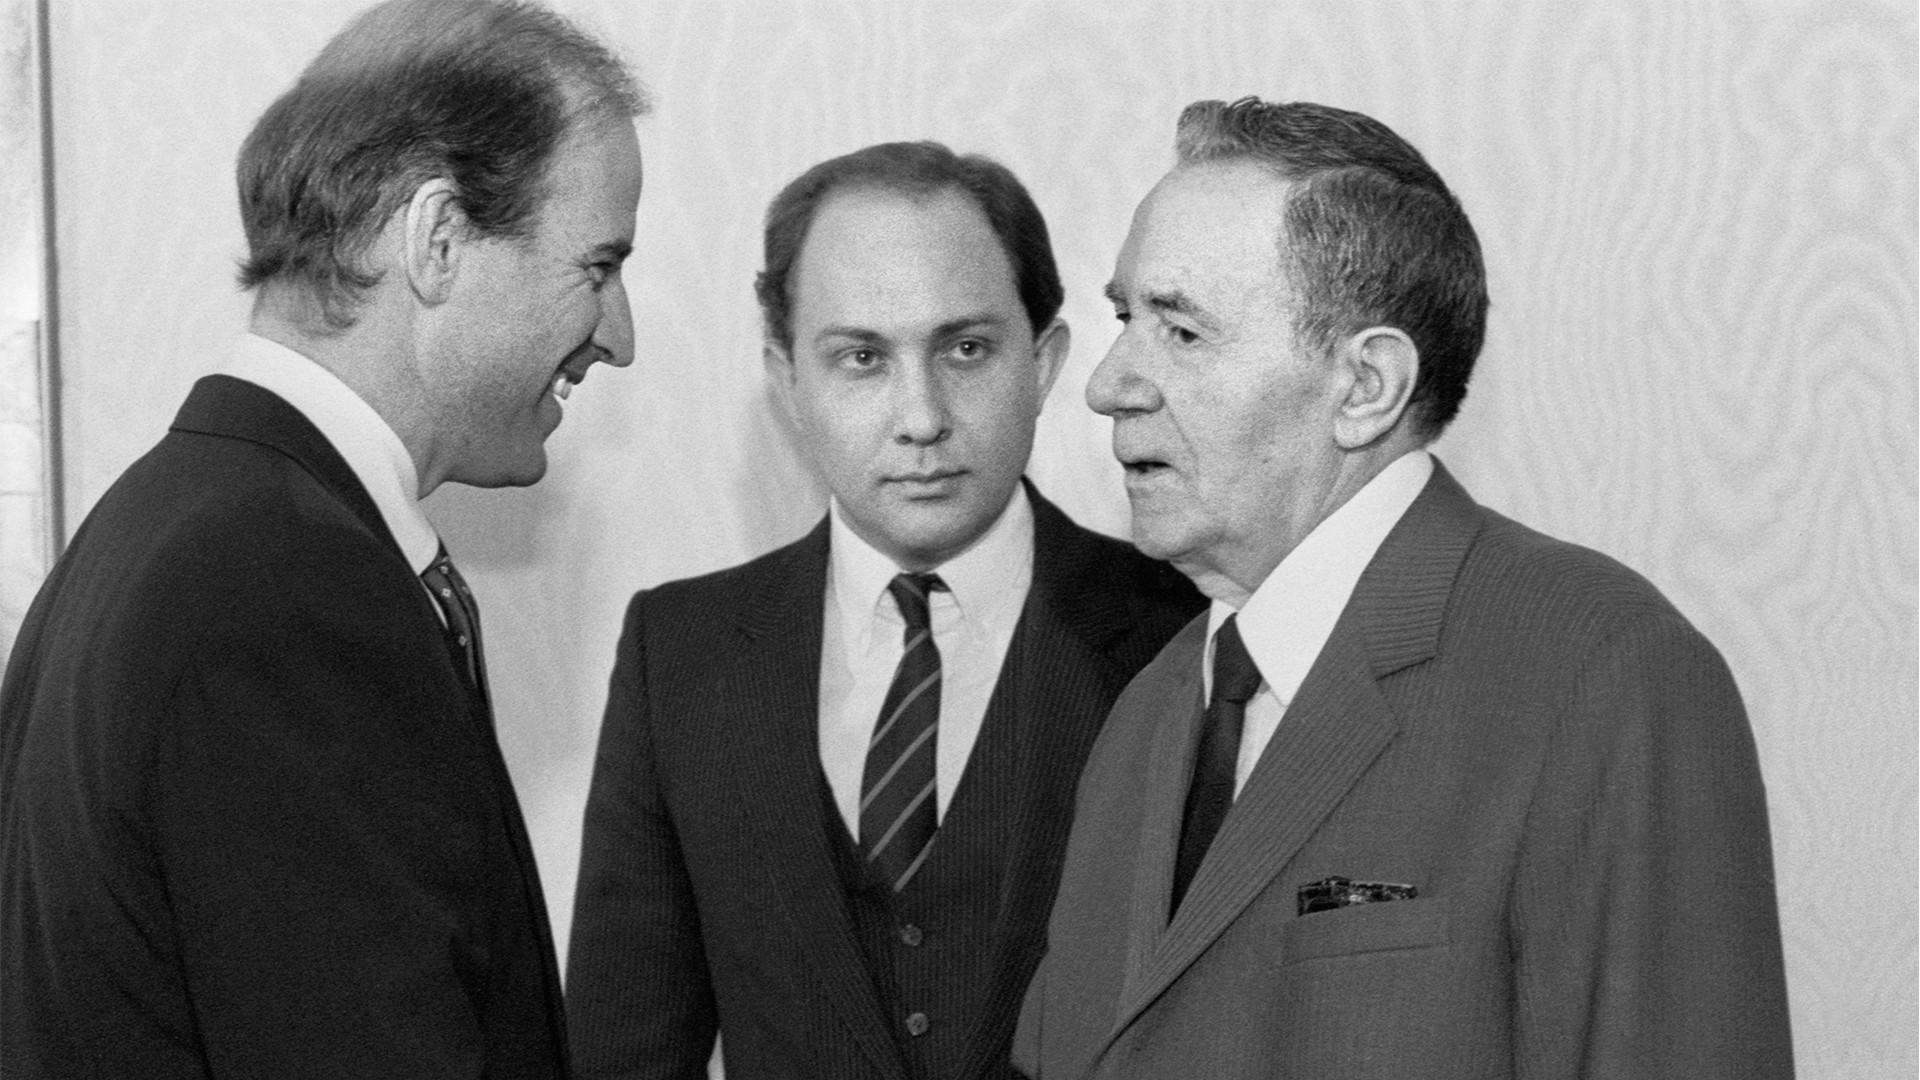 Джо Байдън, Виктор Прокофиев и Андрей Громико, 1988 г.